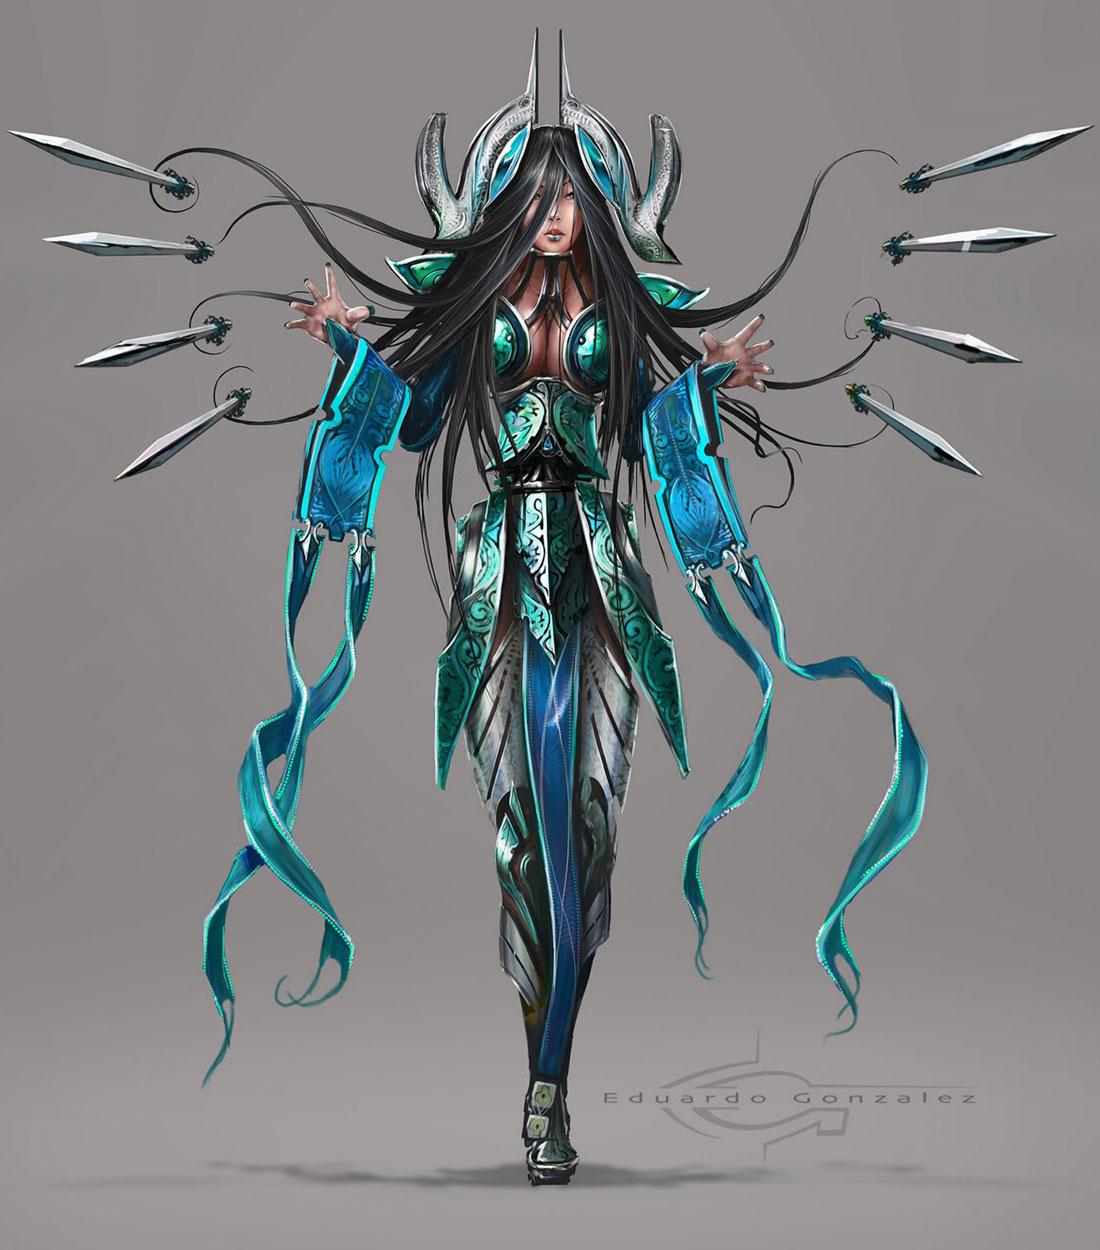 Irelia-Character-Concept-Art-League-of-Legends-PC-wallpaper-wp5009189